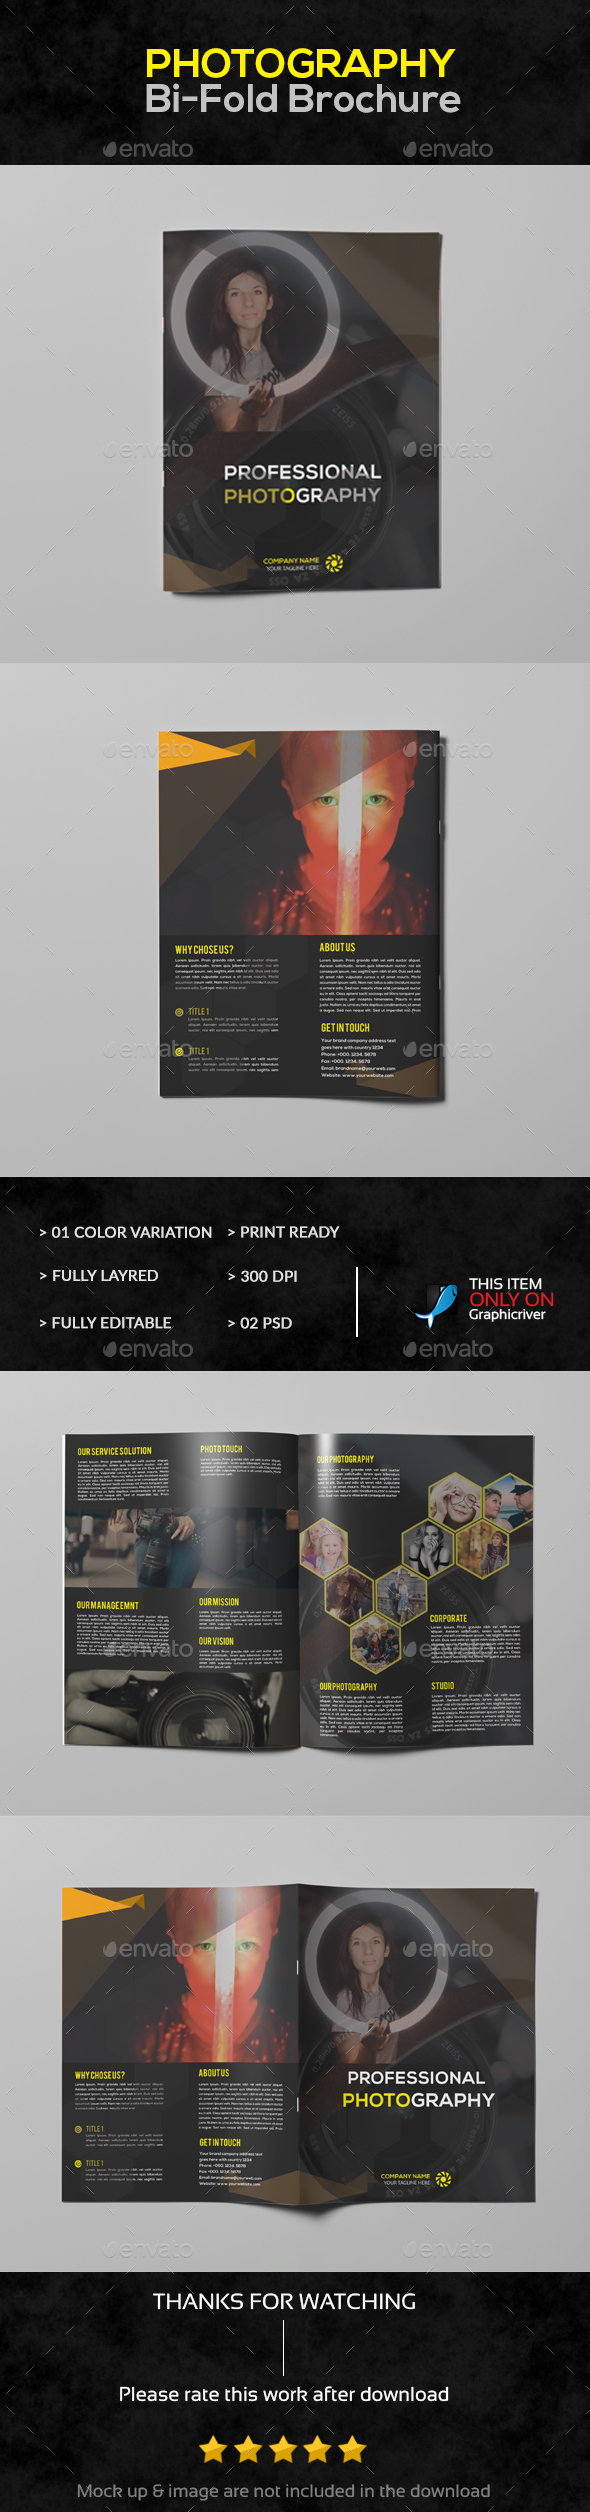 Bi-Fold Photograpy Brochure - Brochures Print Templates